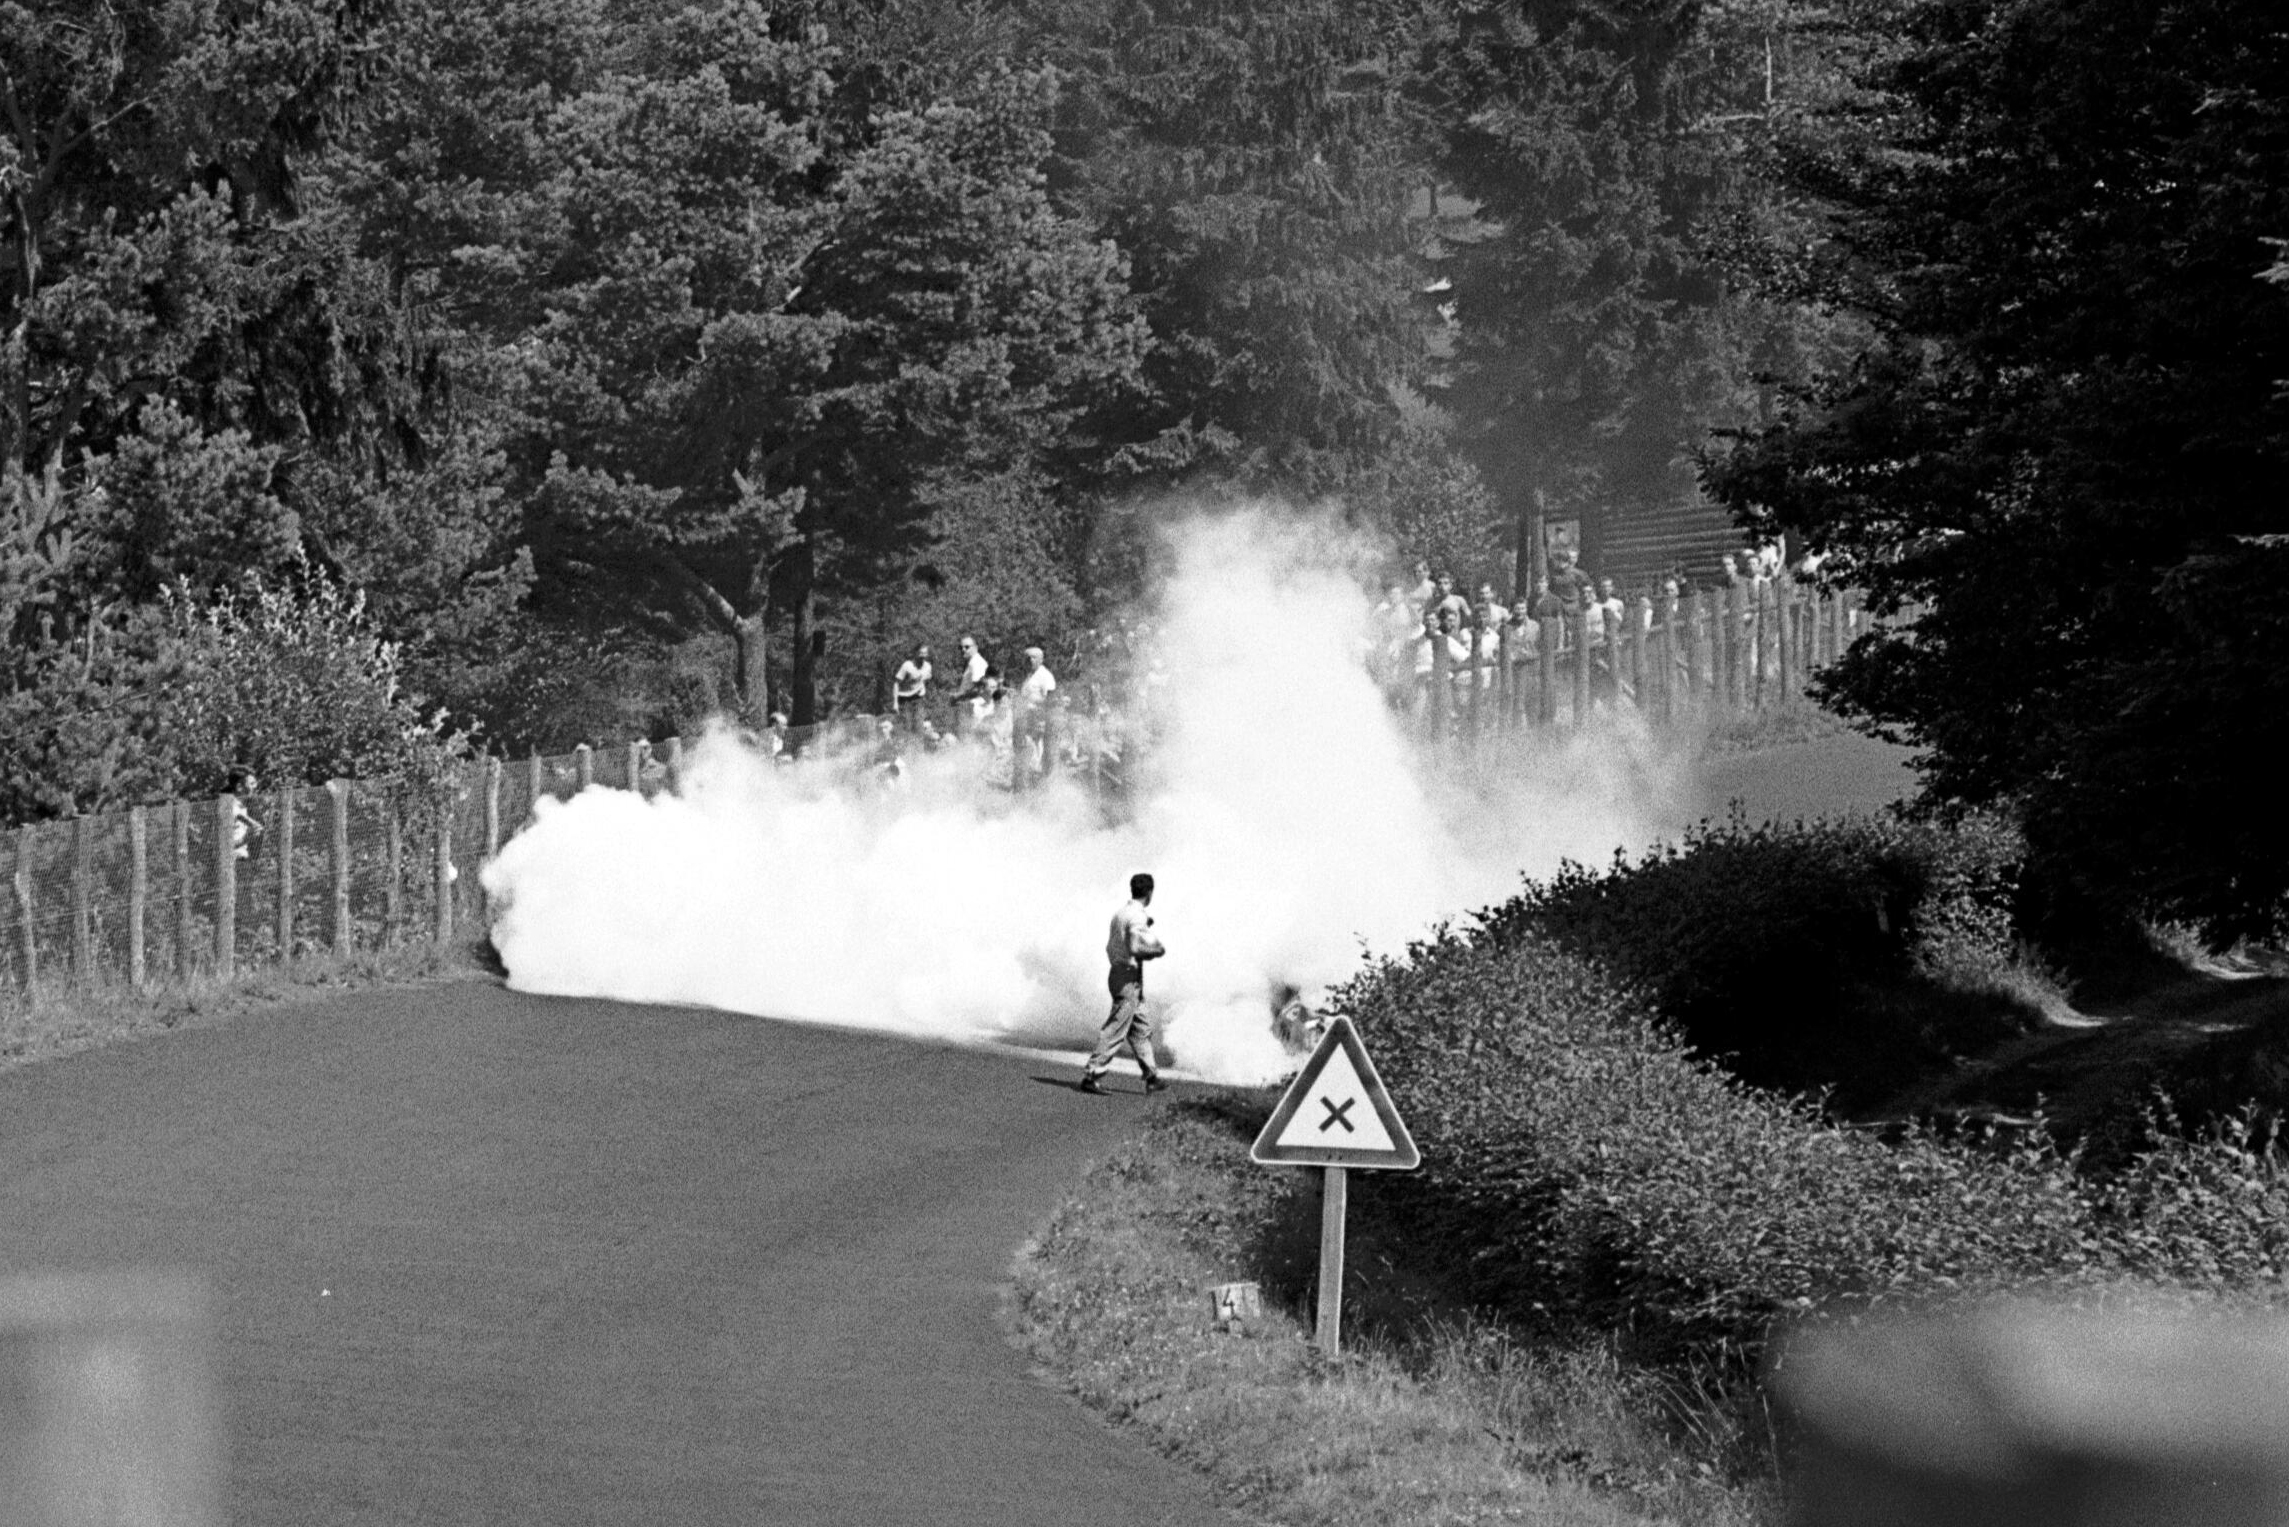 Innes Ireland's Lotus 21 sets itself on fire.